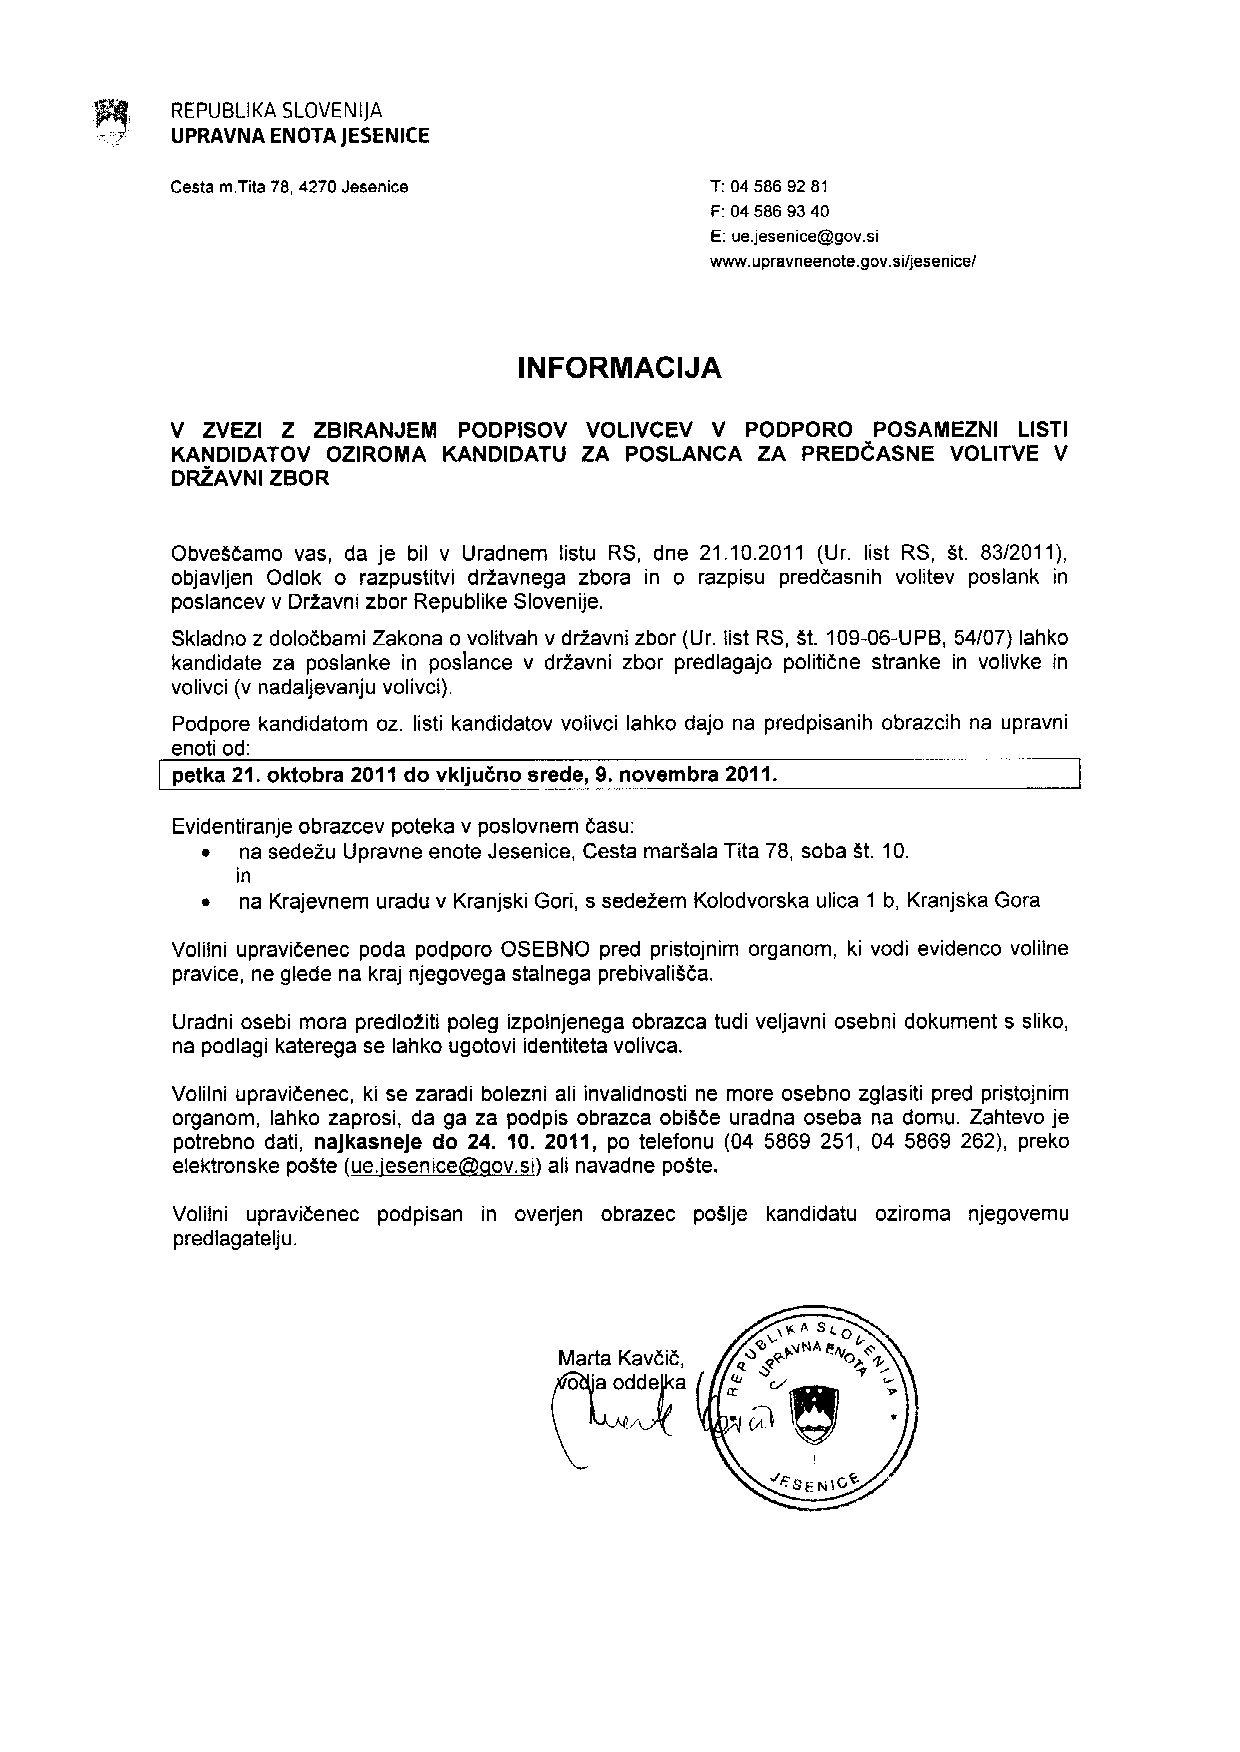 informacija za dravnozborske volitve 2011